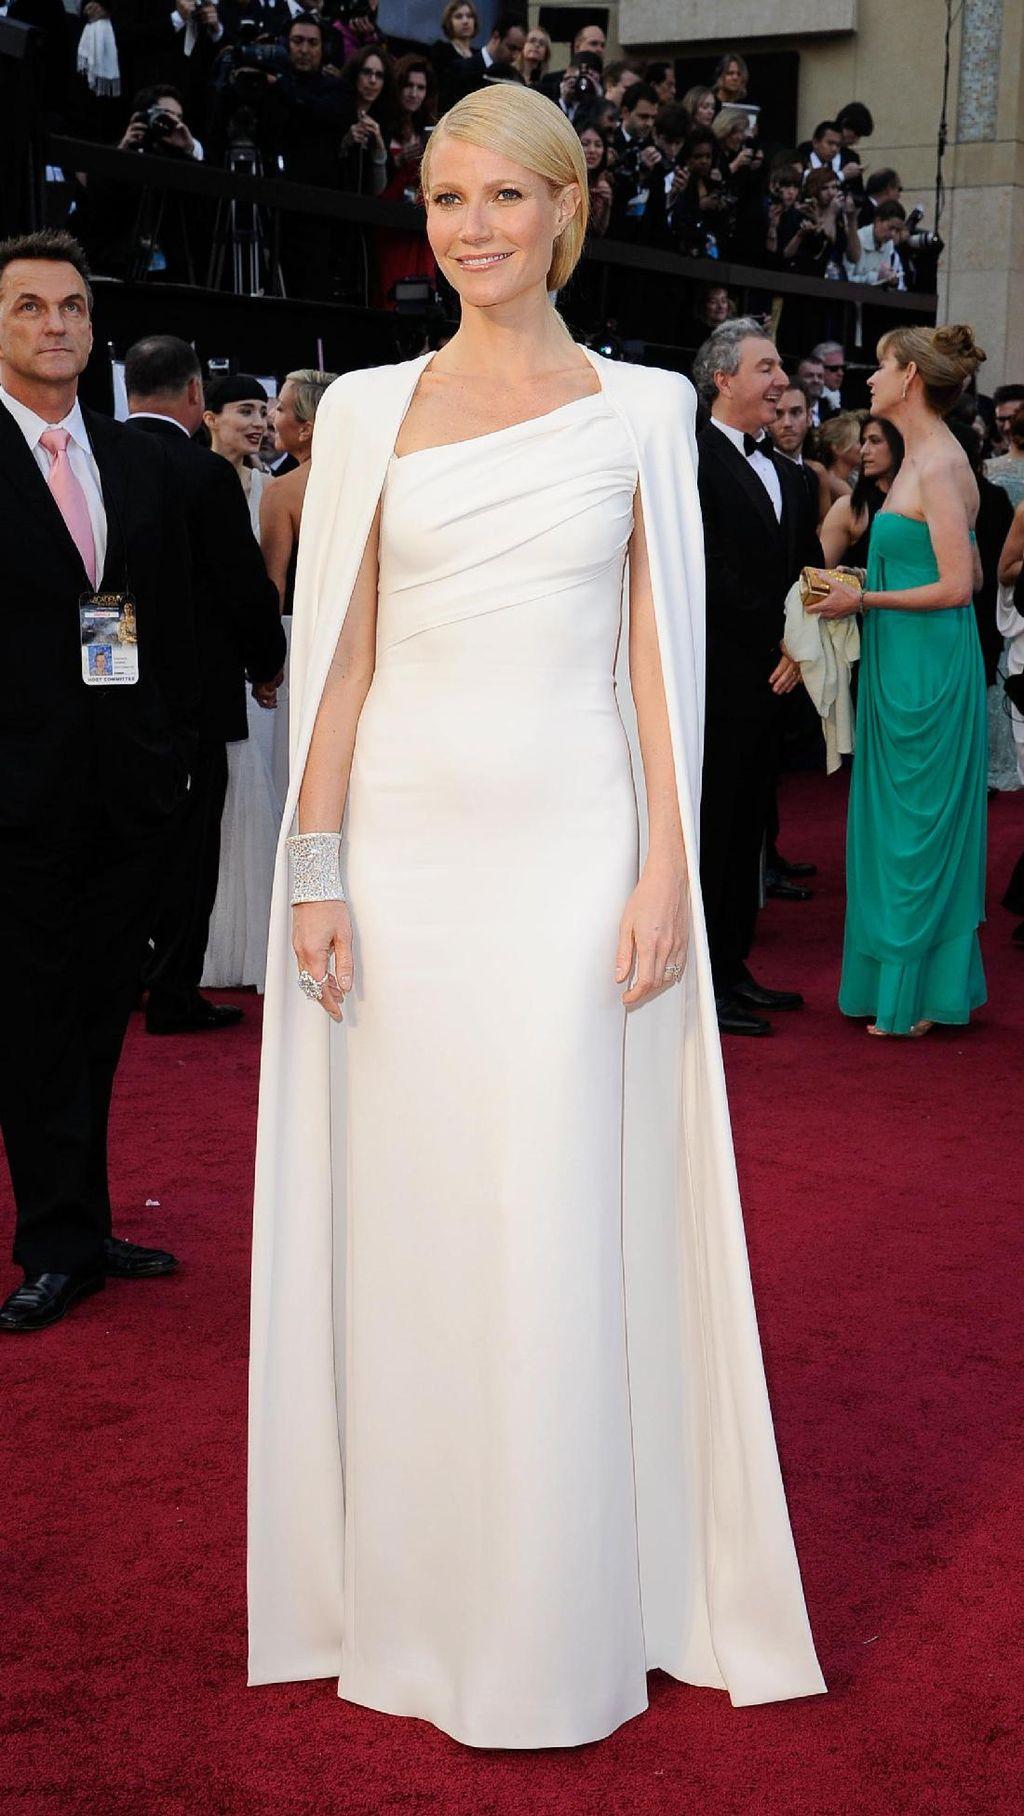 Foto: Pesona Gwyneth Paltrow Dalam Balutan Gaun Malam